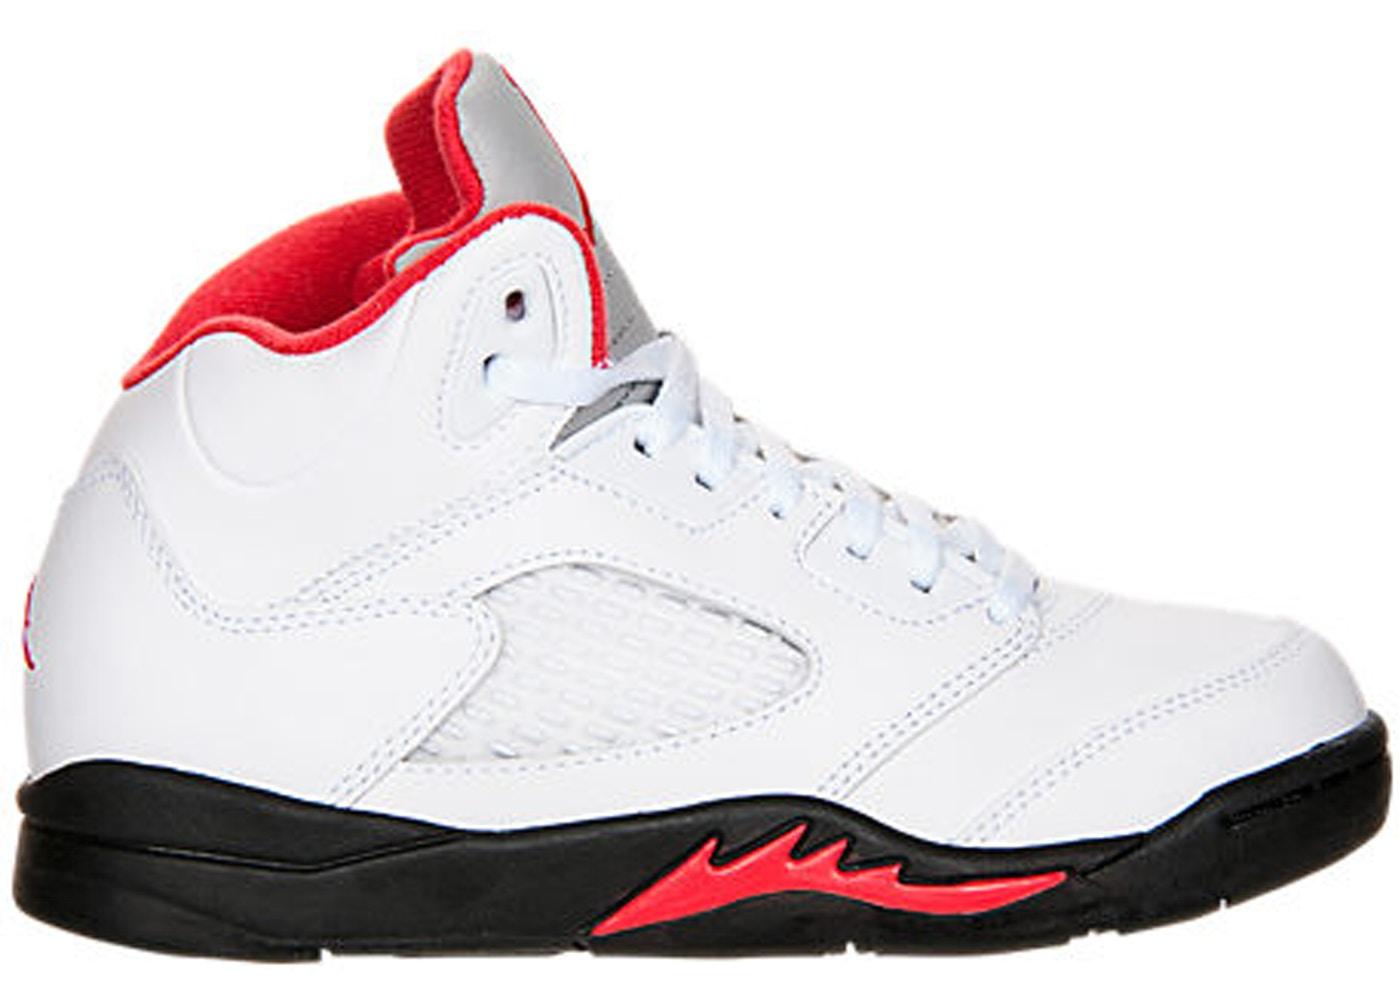 super popular e2acc 42740 Jordan 5 Retro Fire Red 2013 (PS)